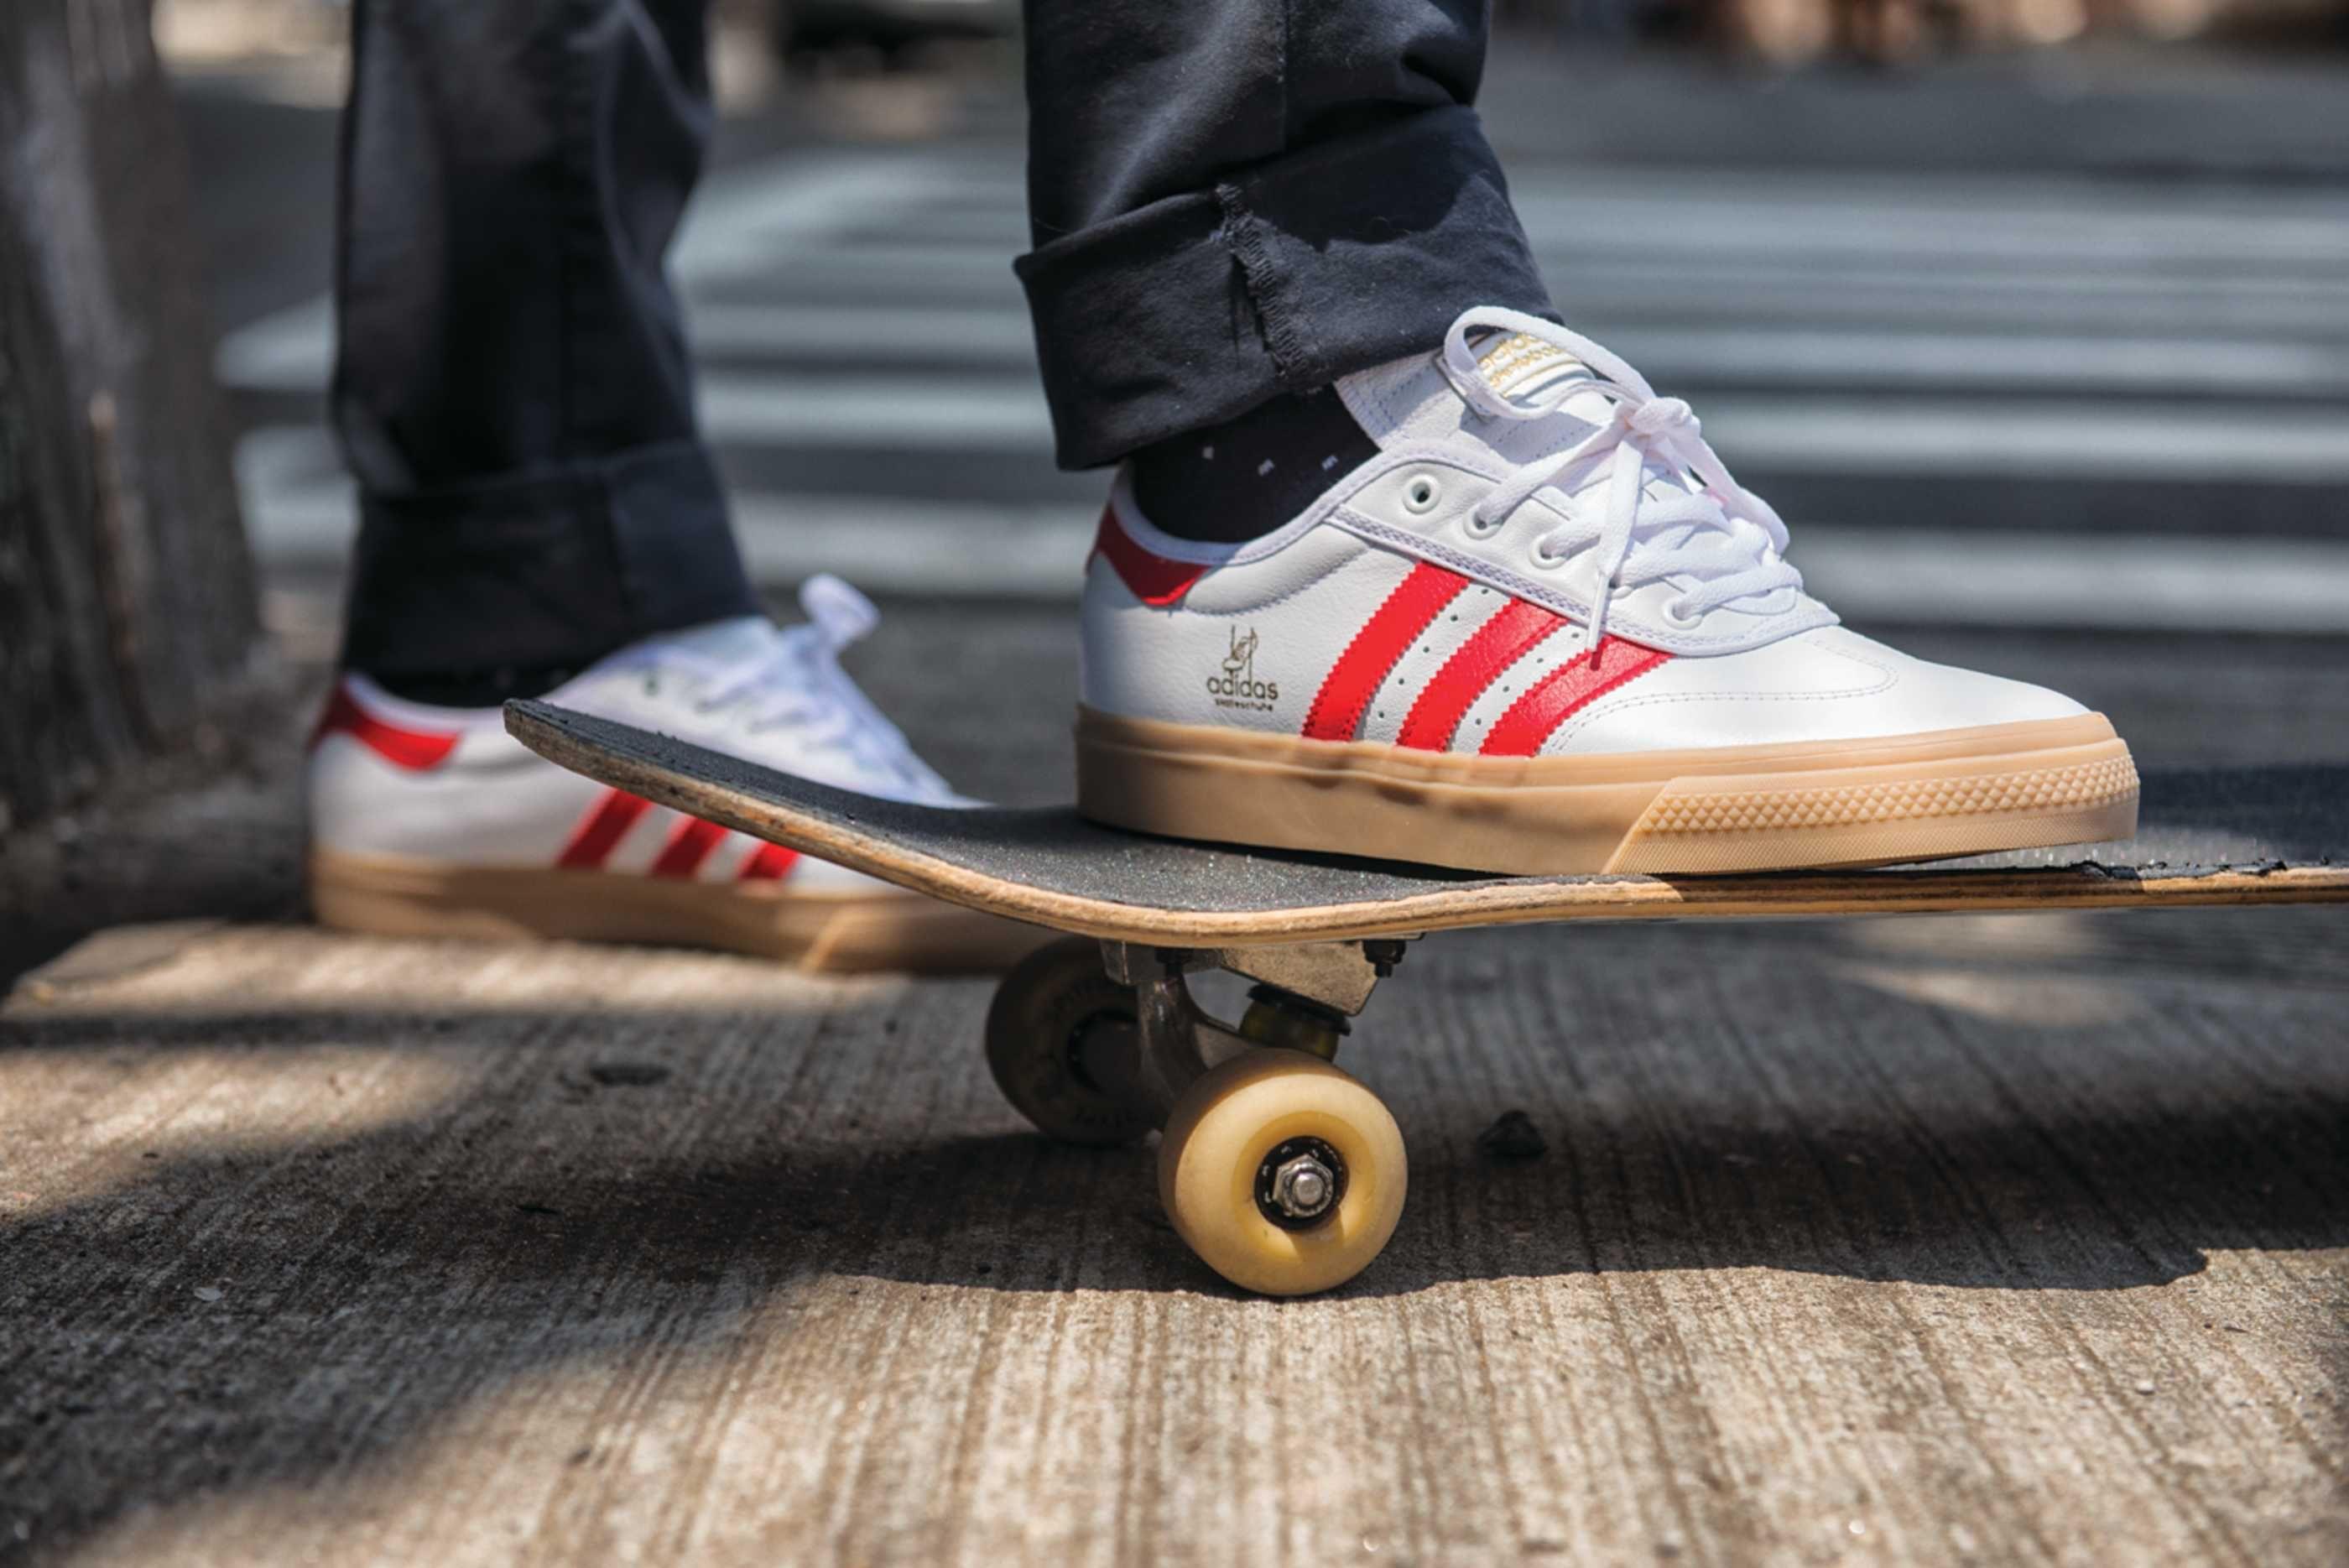 Adidas Skateboarding Adi Ease Universal Adv Scarpe Da Skate